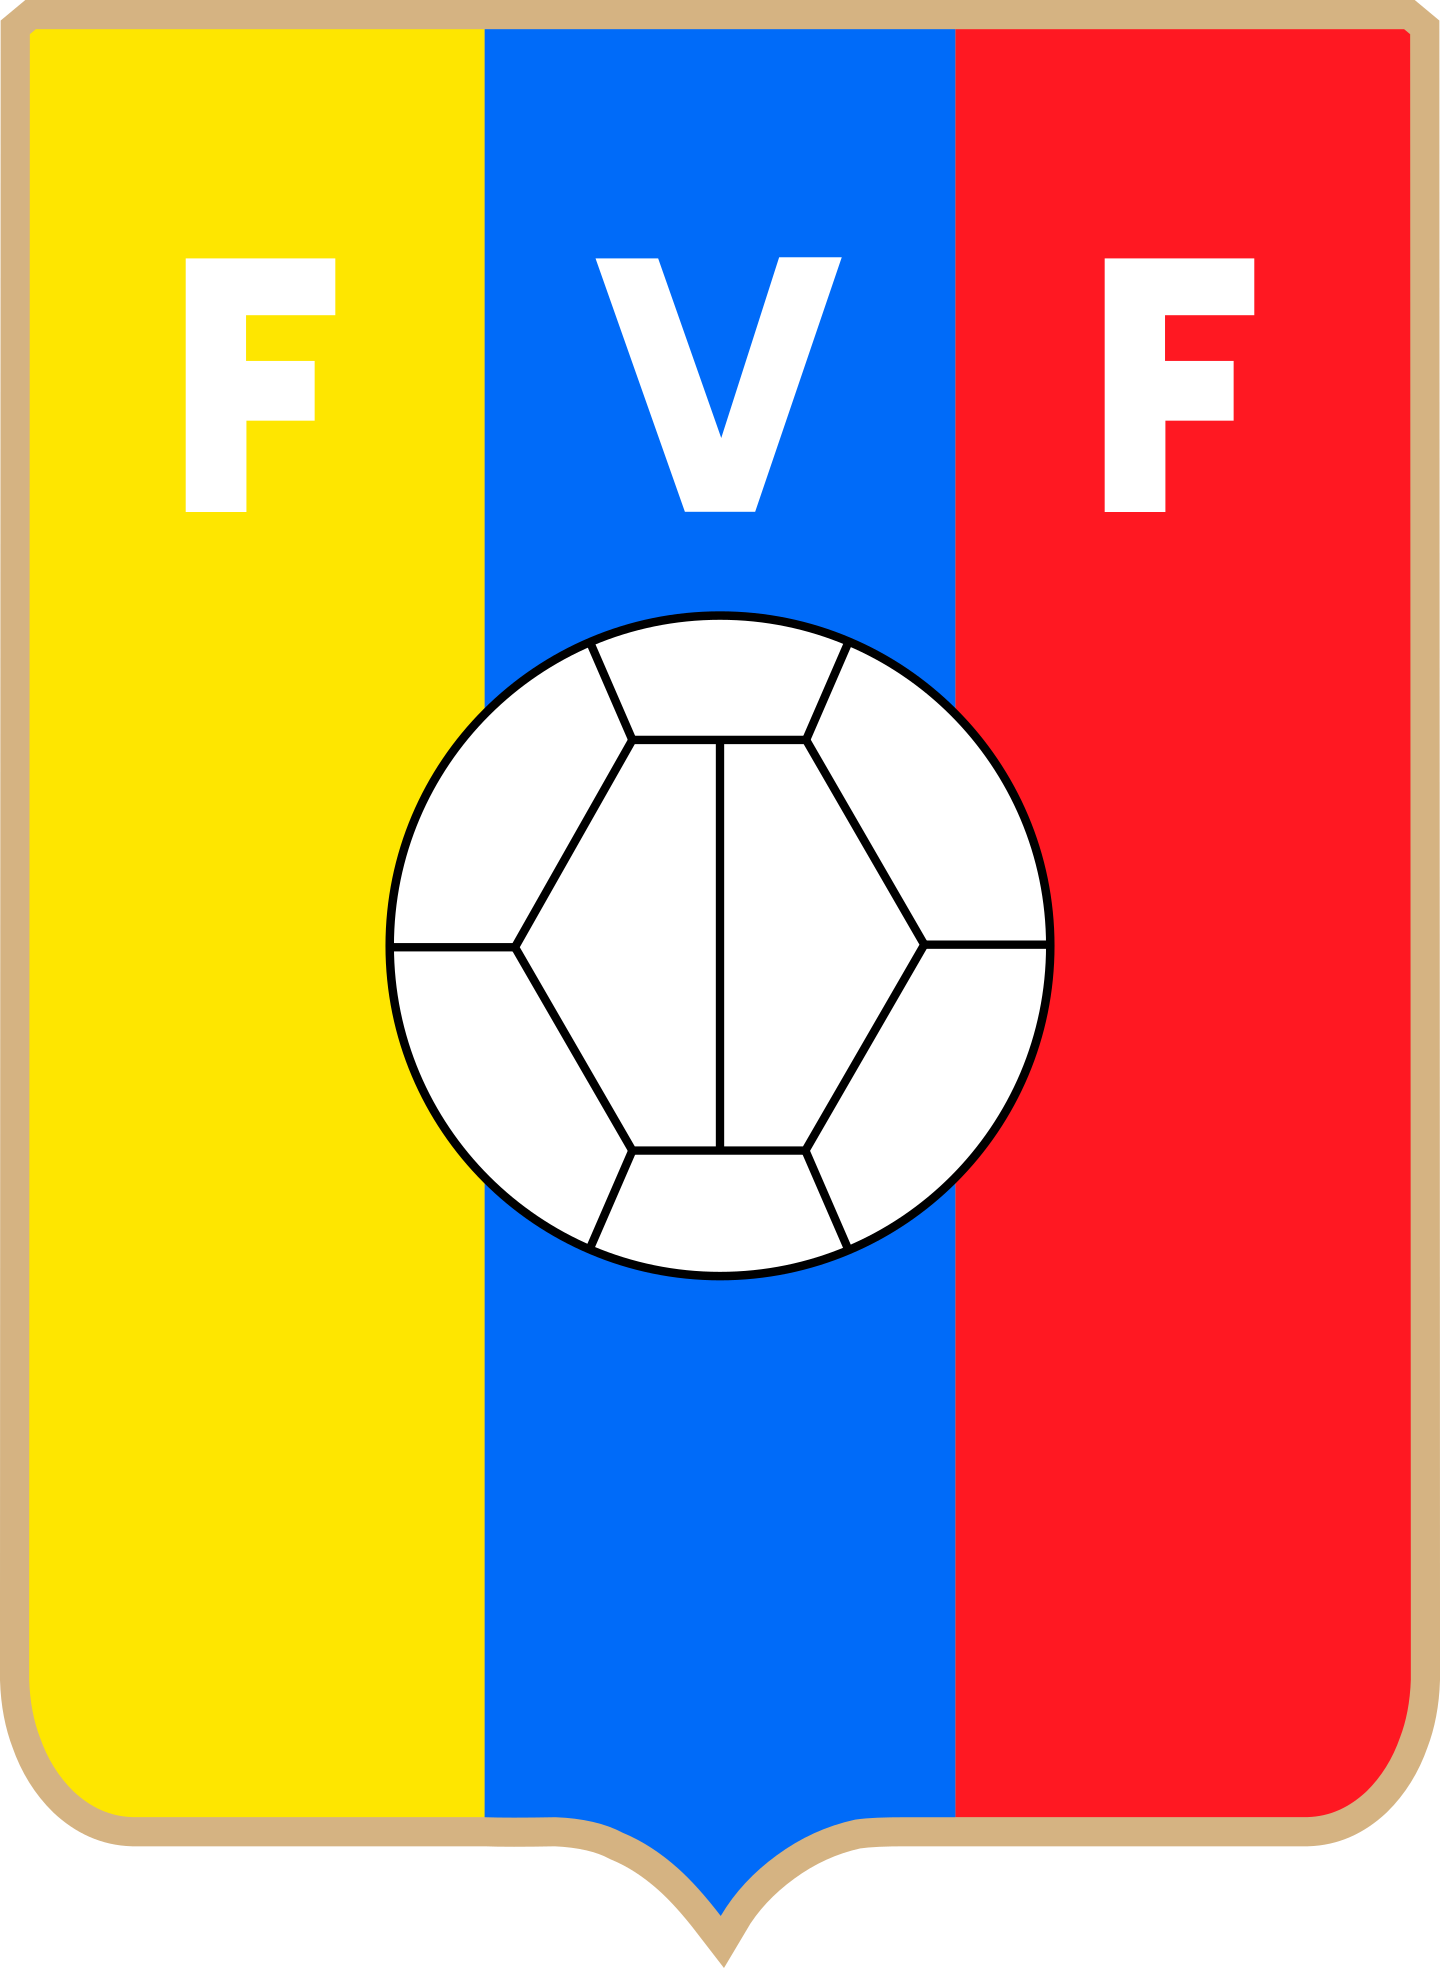 fvf seleccion de futbol de venezuela logo 3 - FVF Logo - Selección de fútbol de Venezuela Logo